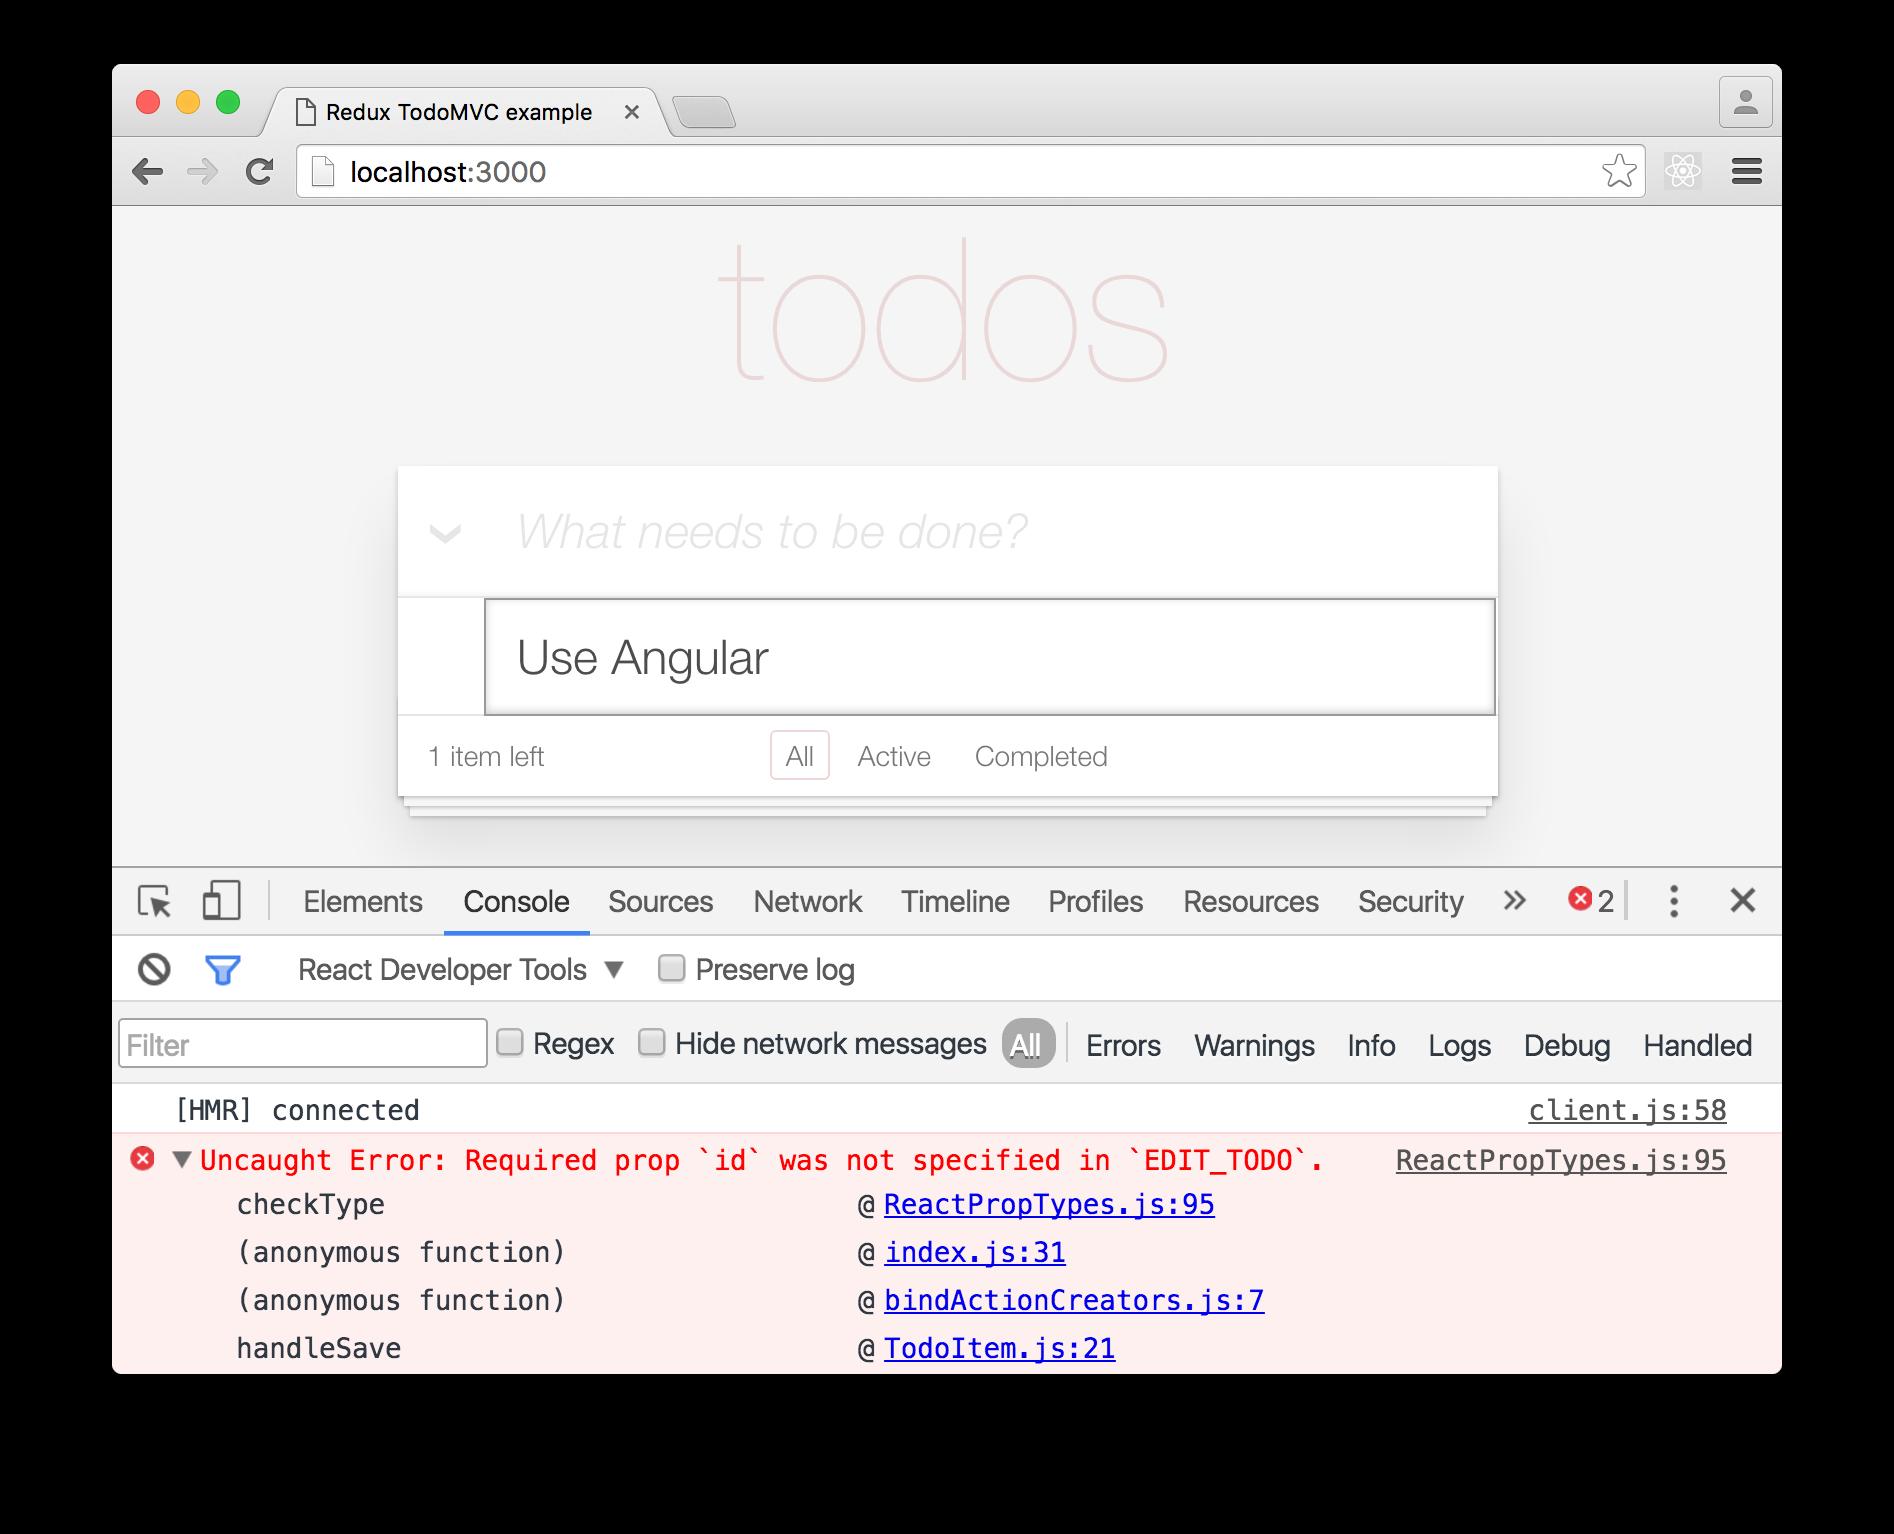 Error: Required prop id was not specified in EDIT_TODO.